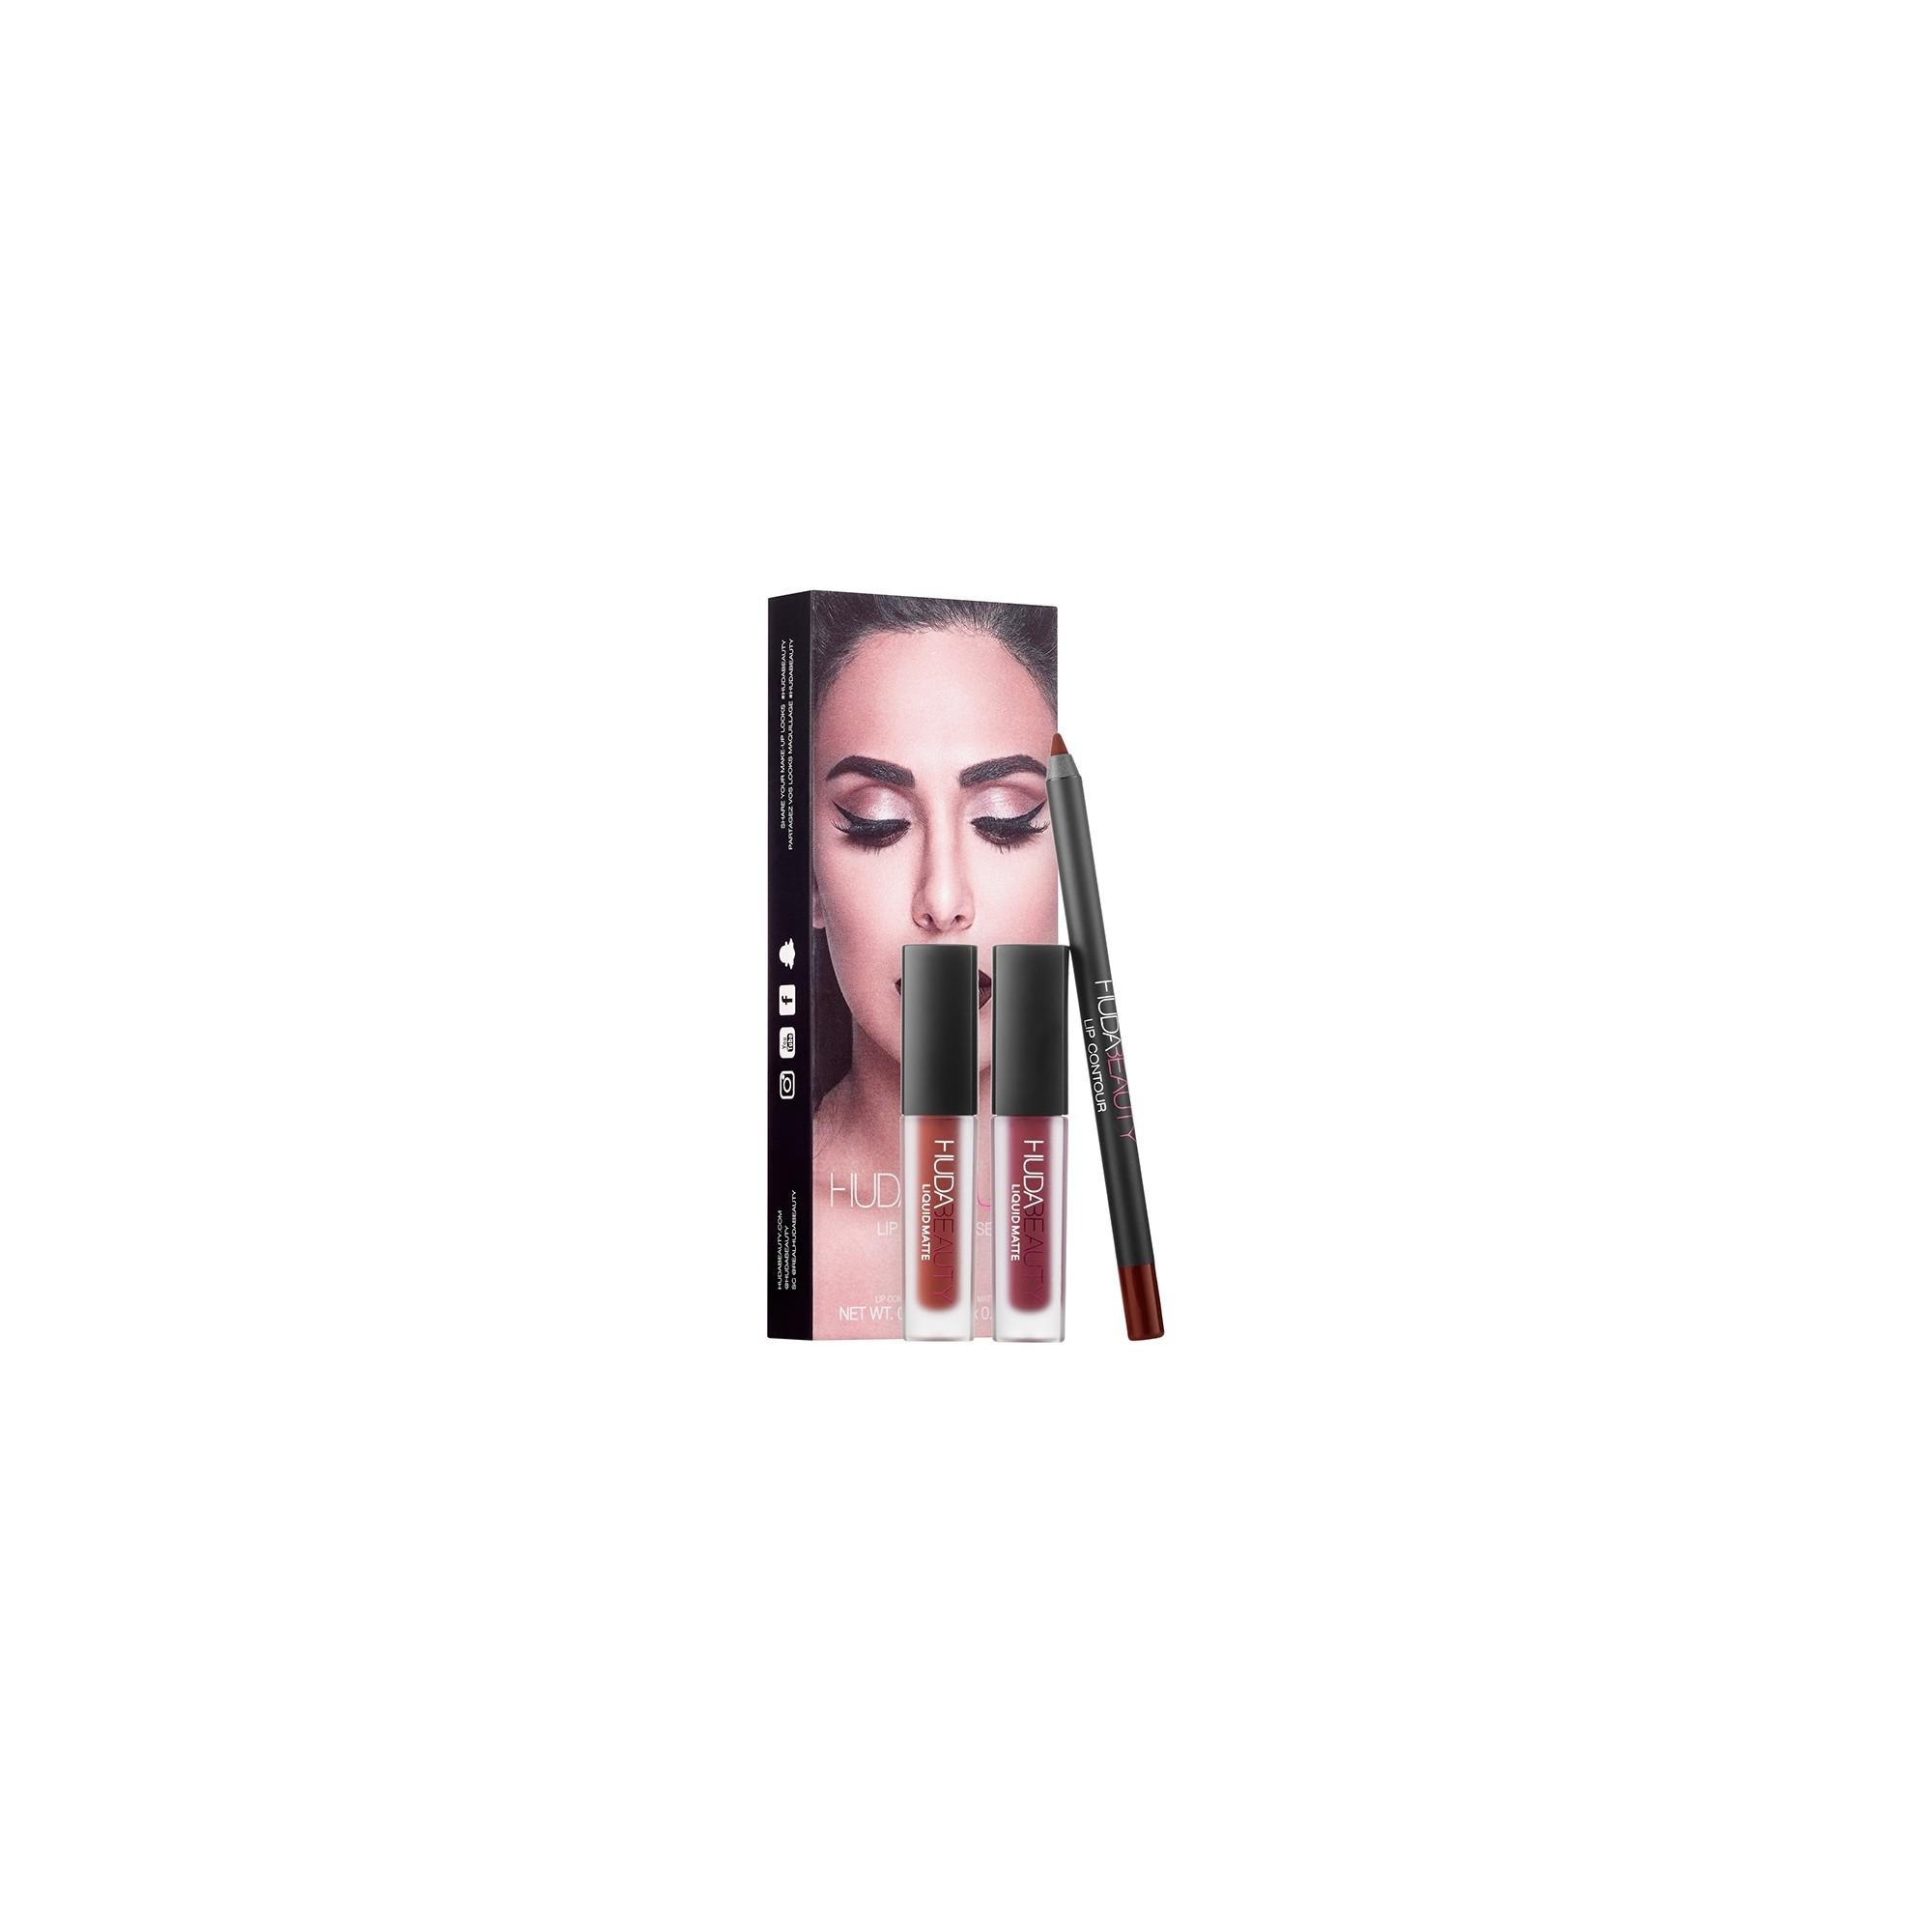 Huda Beauty Lip Contour Set Vixen - Famous